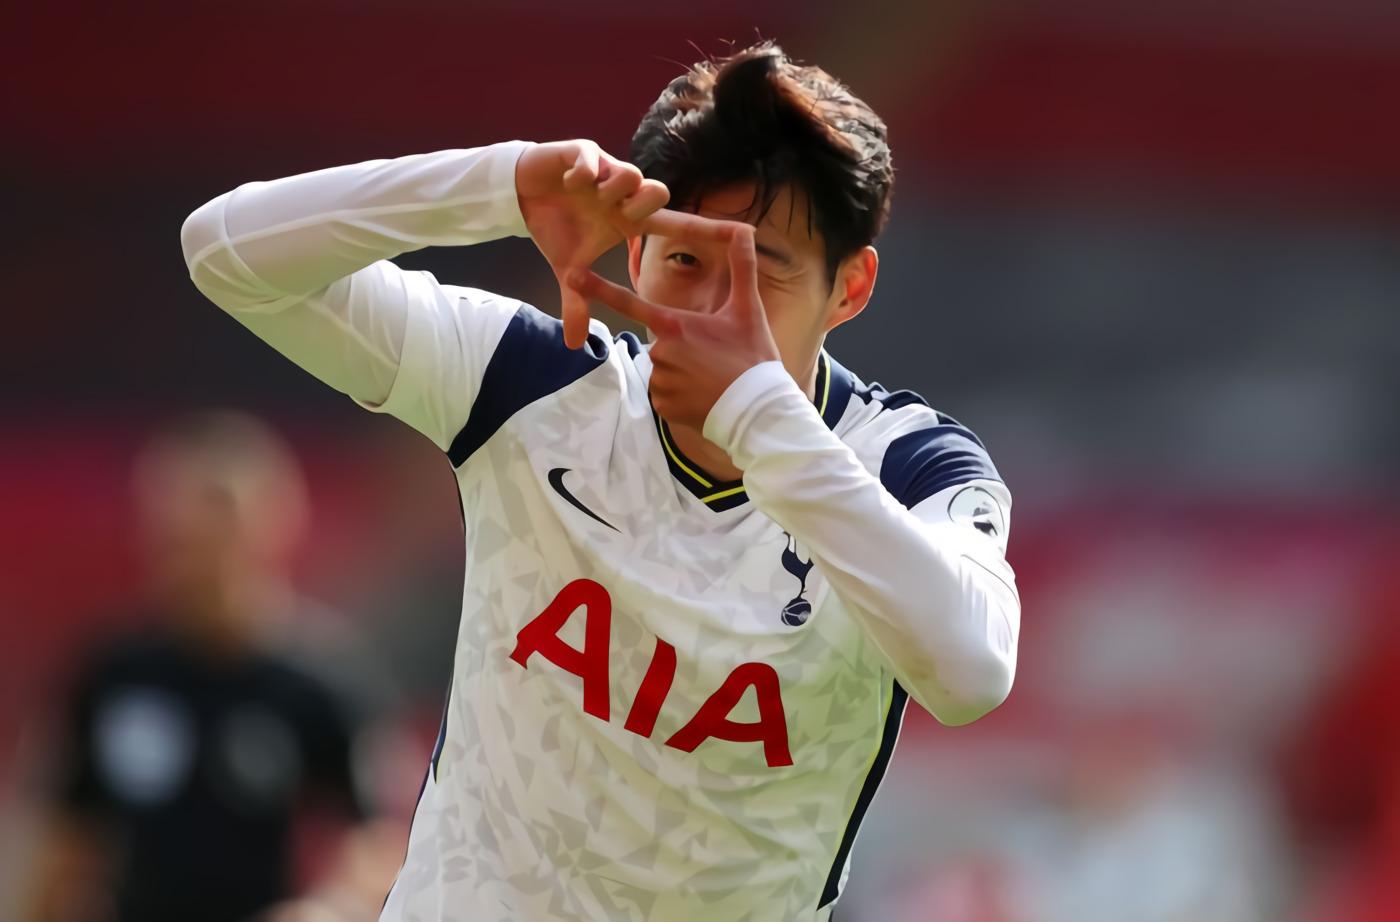 Son Heung-min Quat-trick, Spurs Kalahkan Southampton 5-2